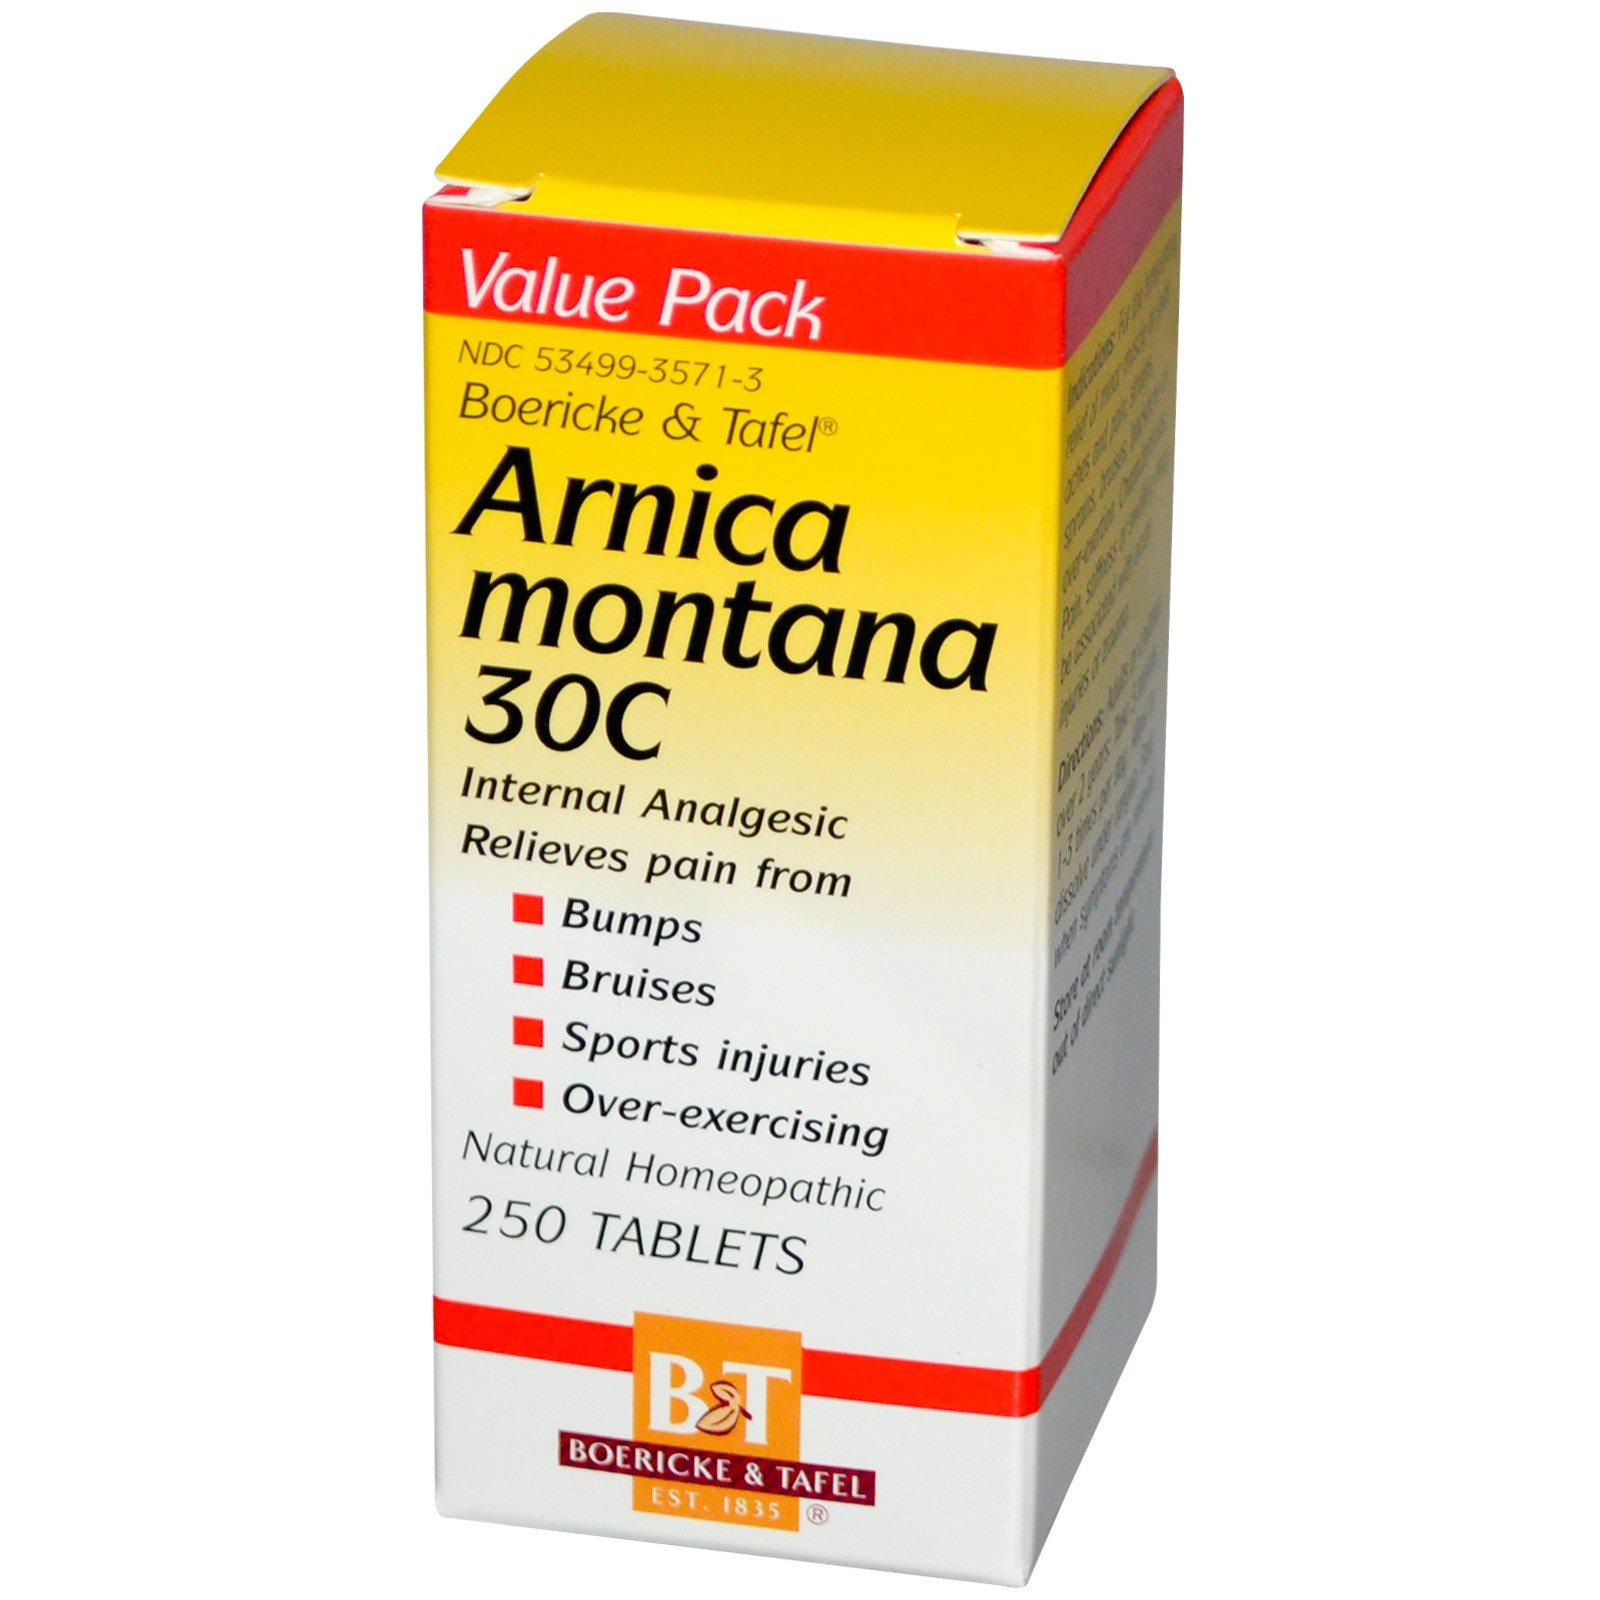 Boericke & Tafel, Арника горная 30C, 250 таблеток